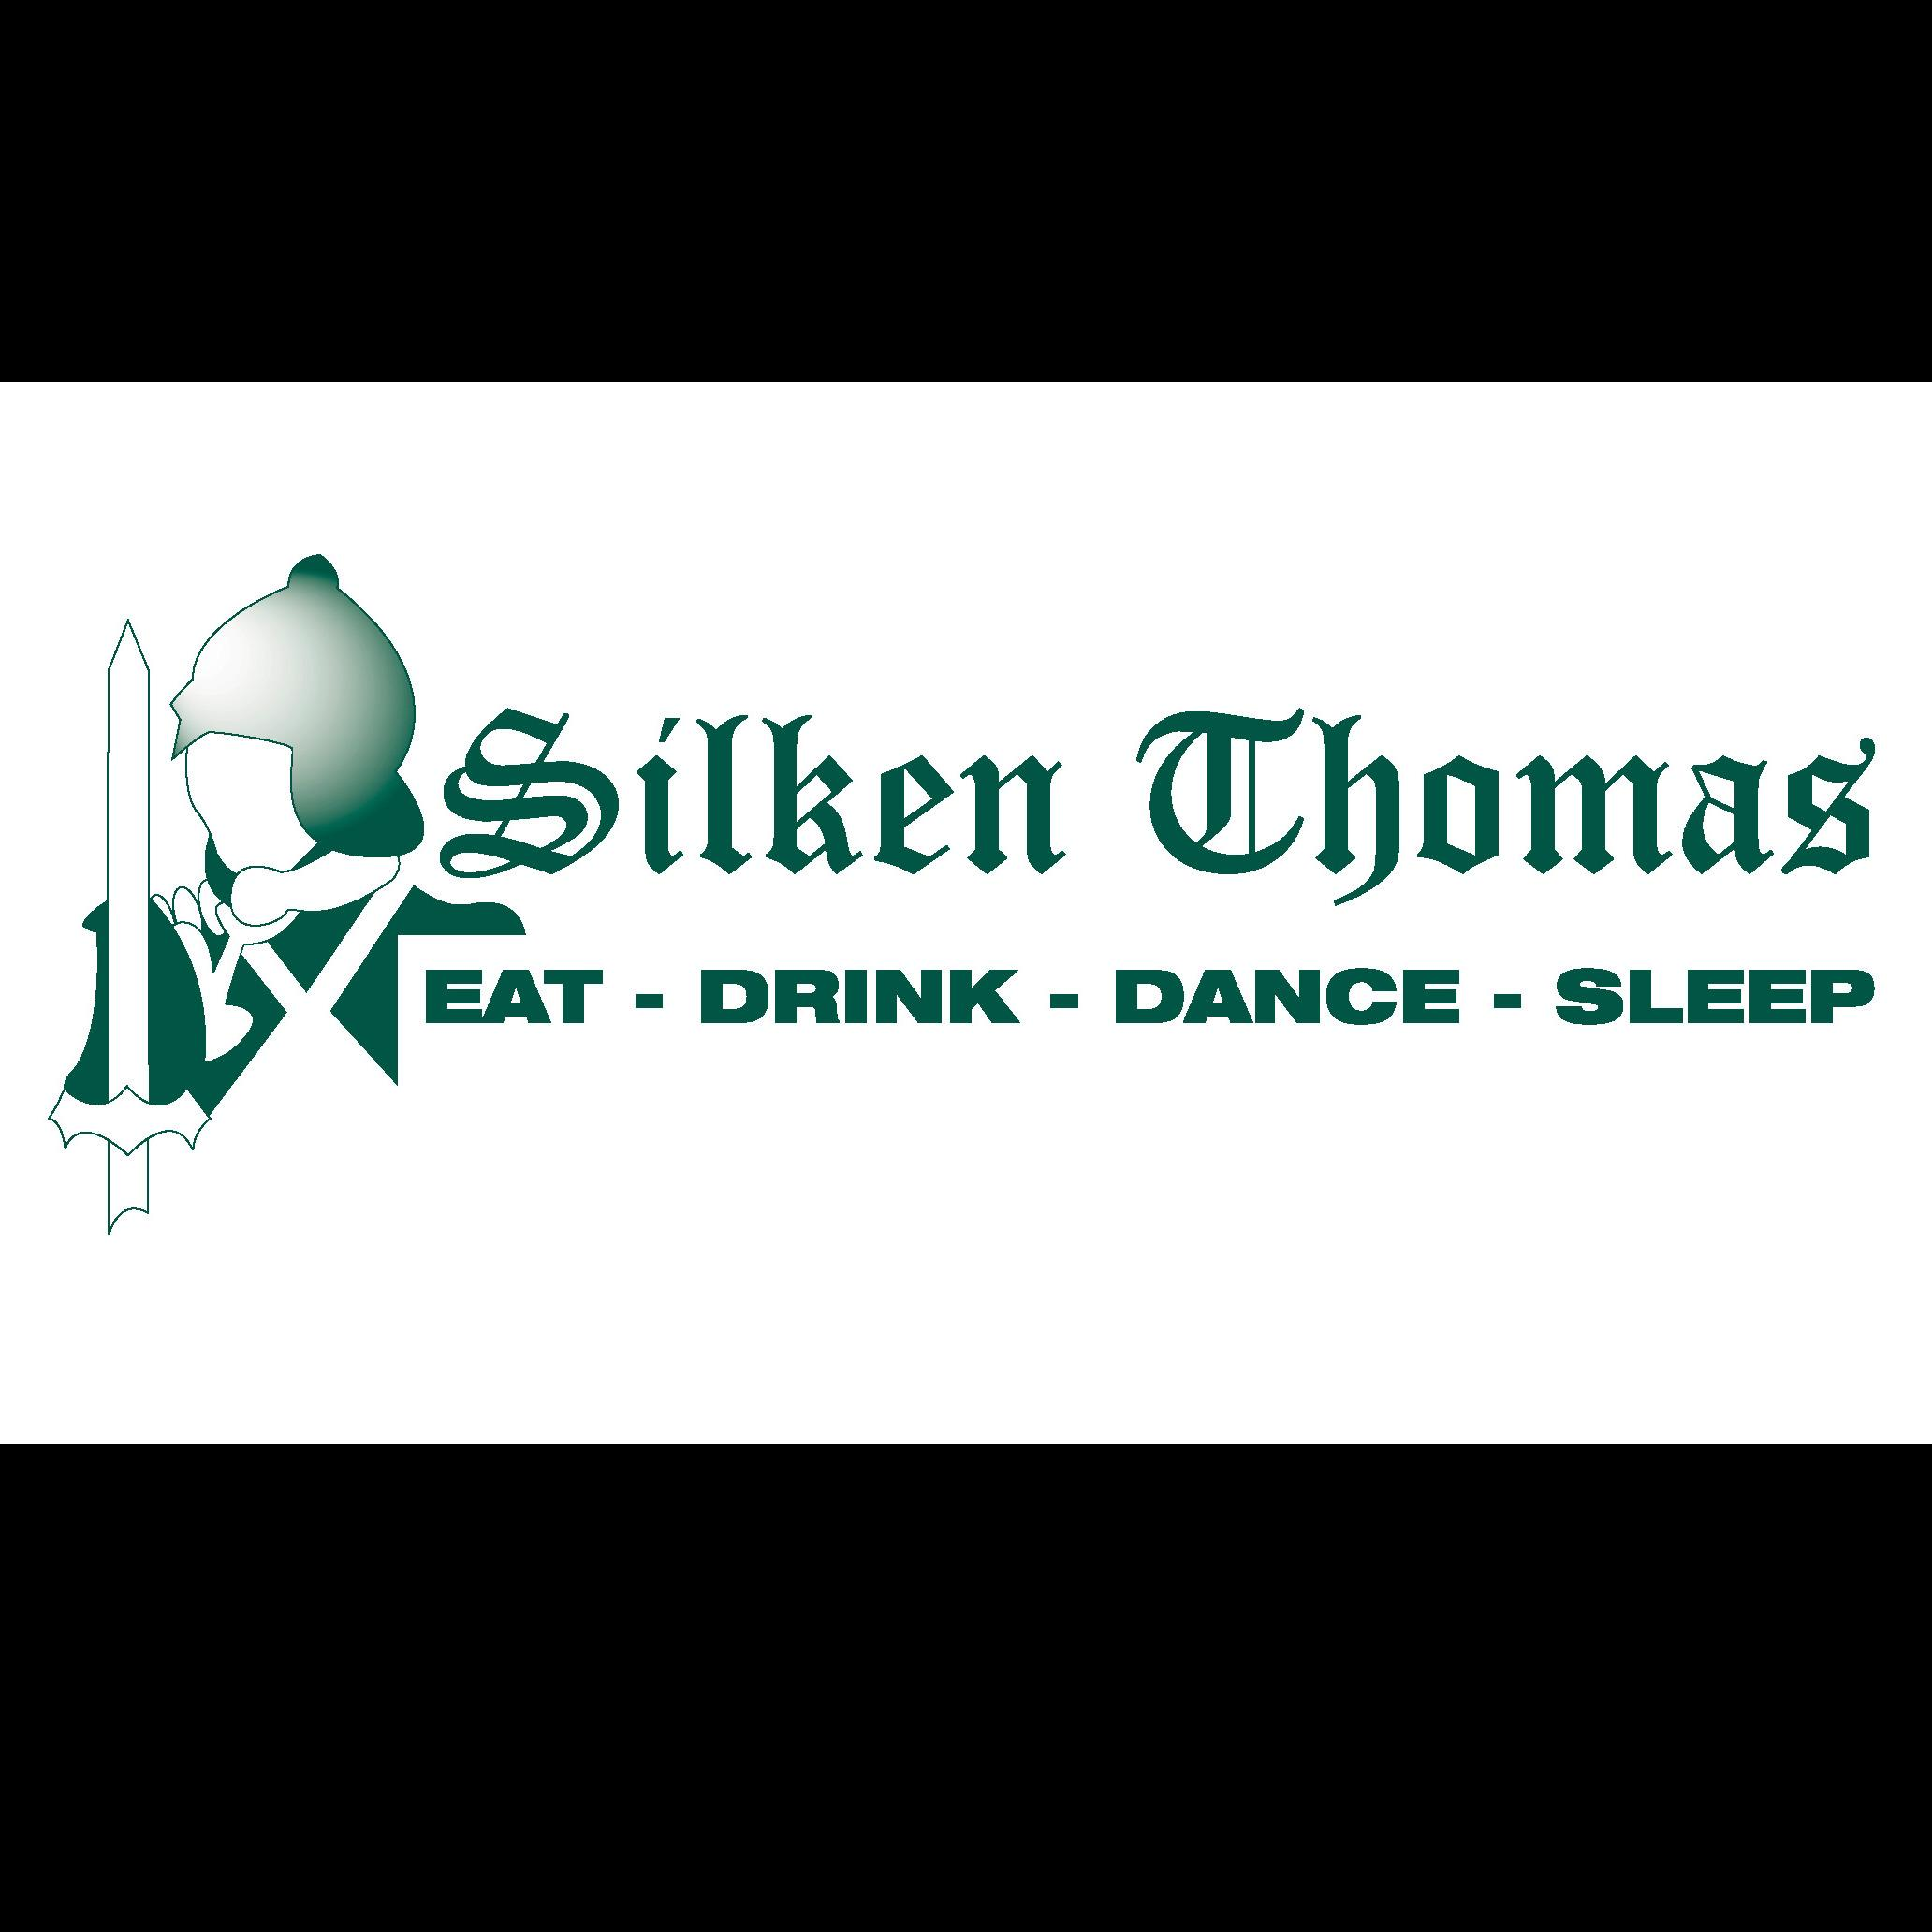 Silken Thomas Accomodation